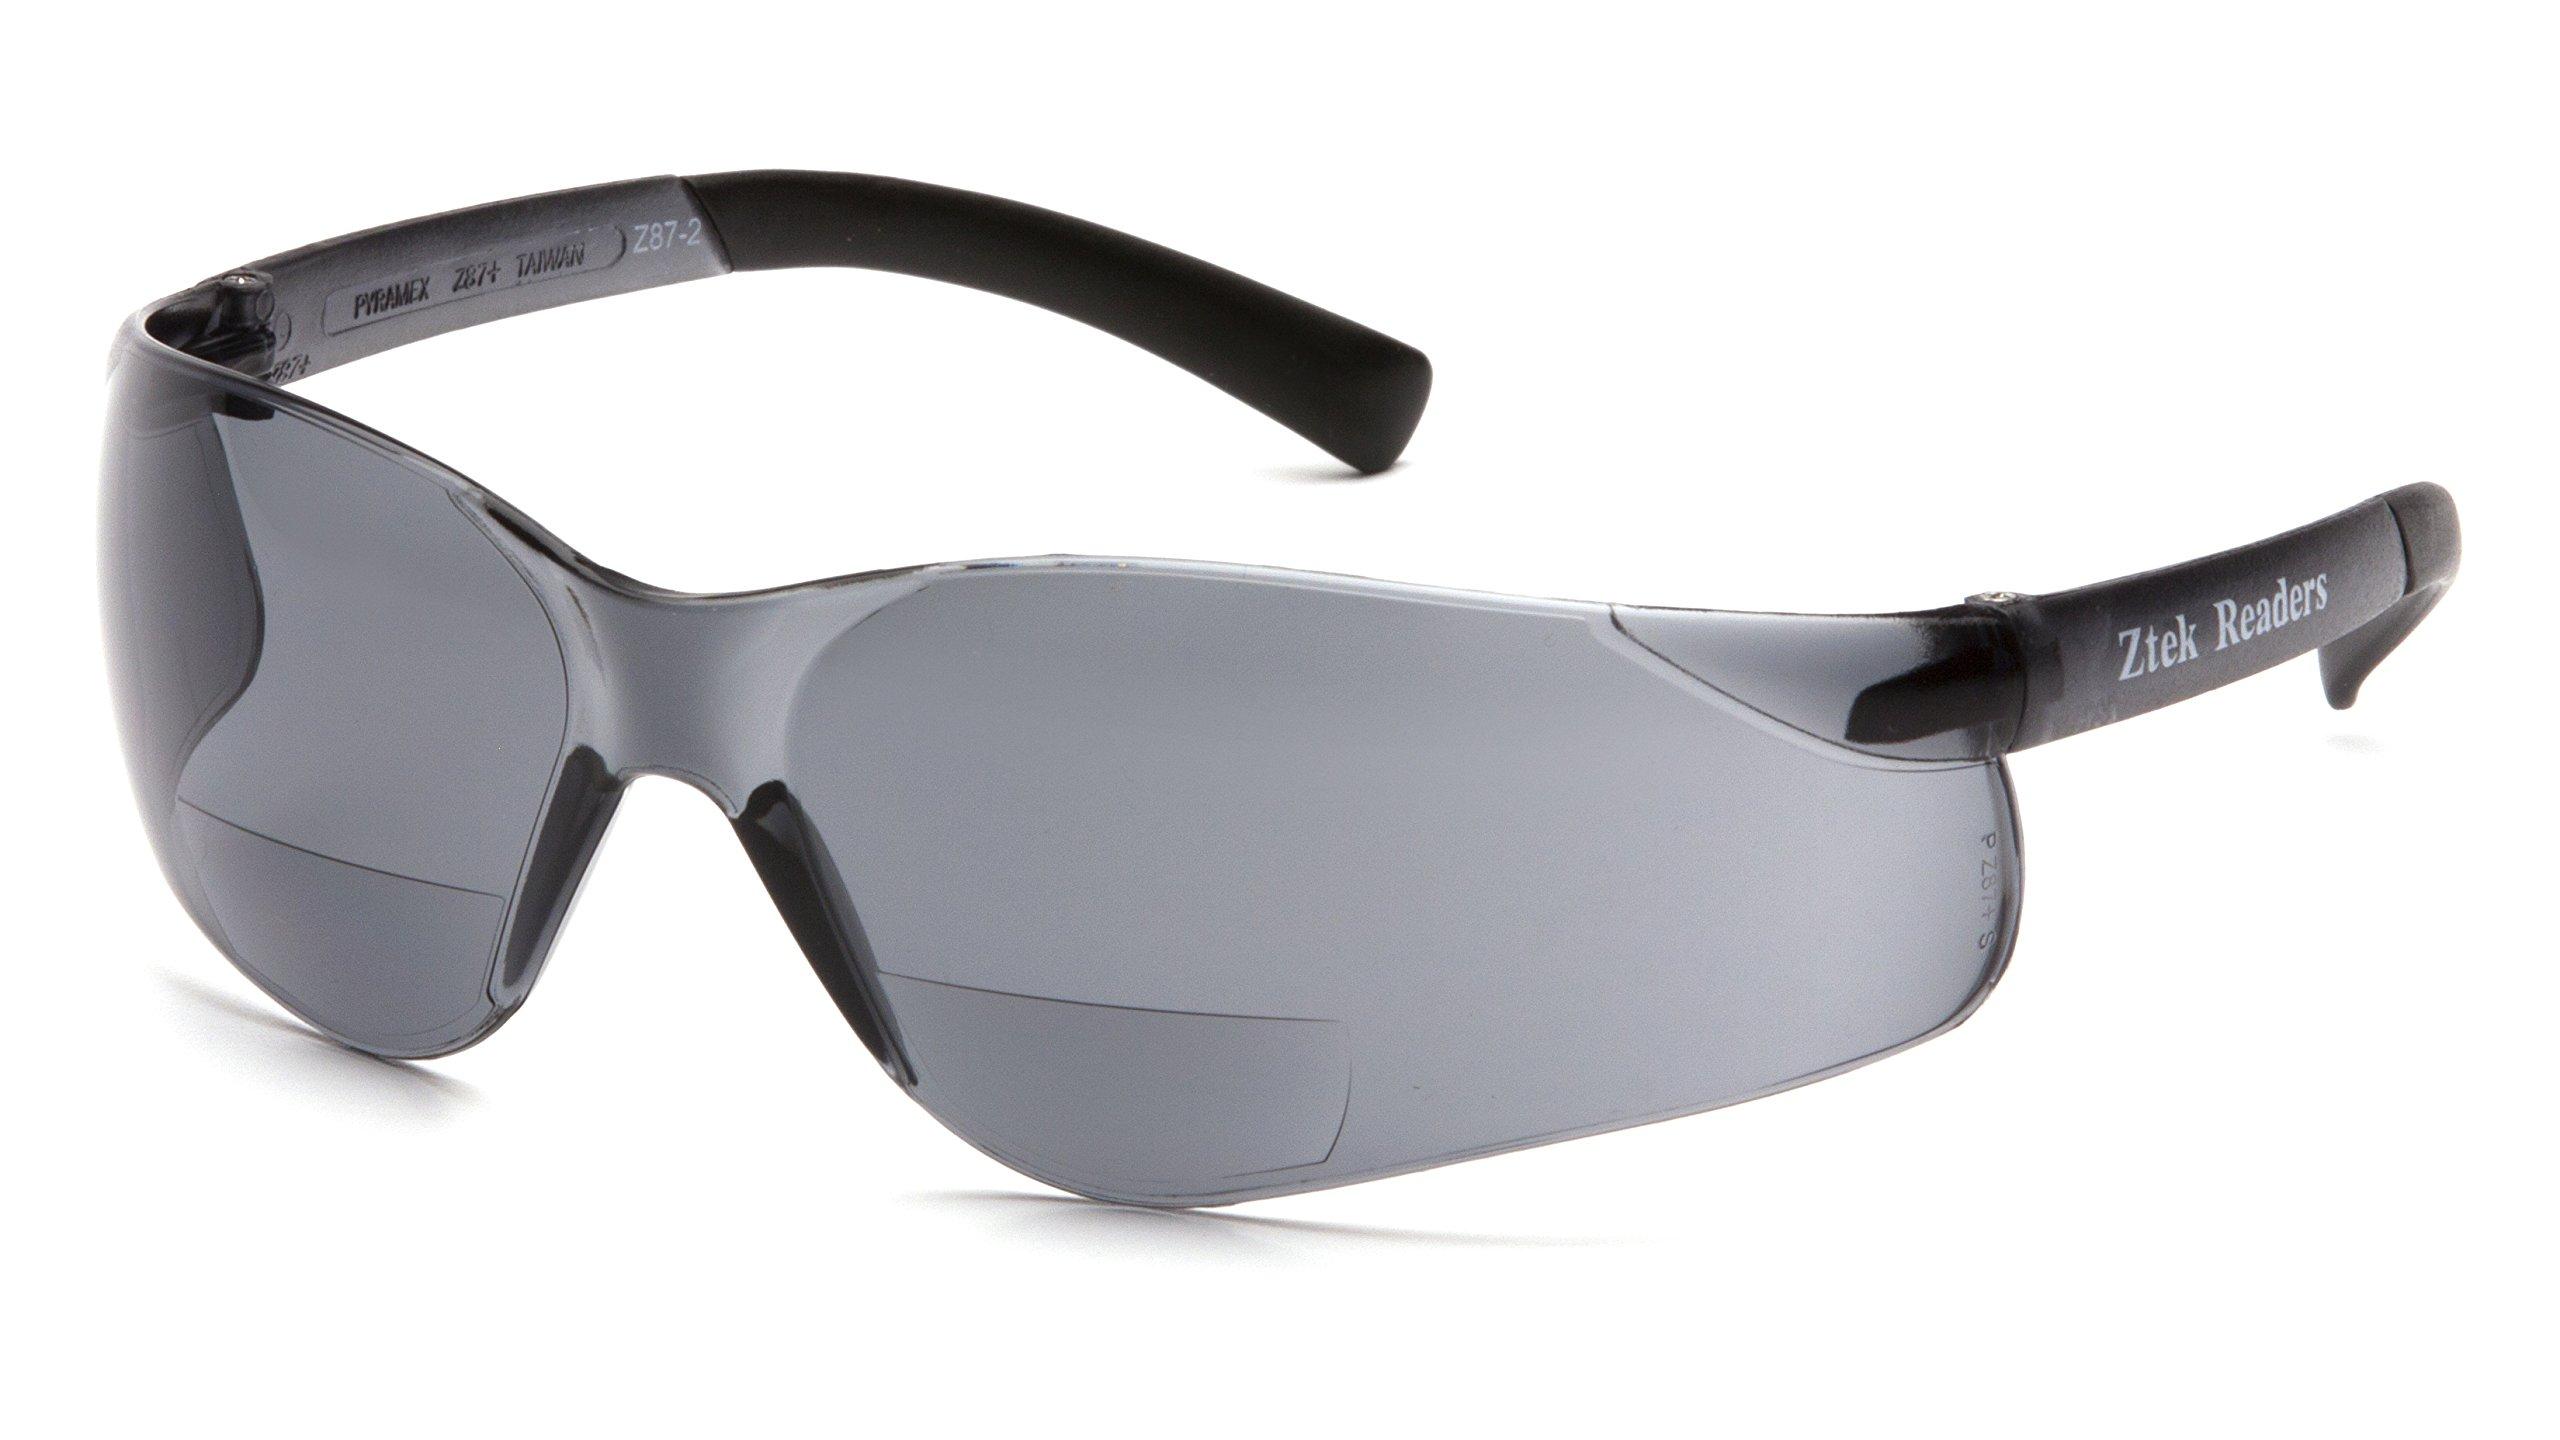 Pyramex S2520R25 Ztek Readers Safety Glasses, + 2.5 Lens, Gray